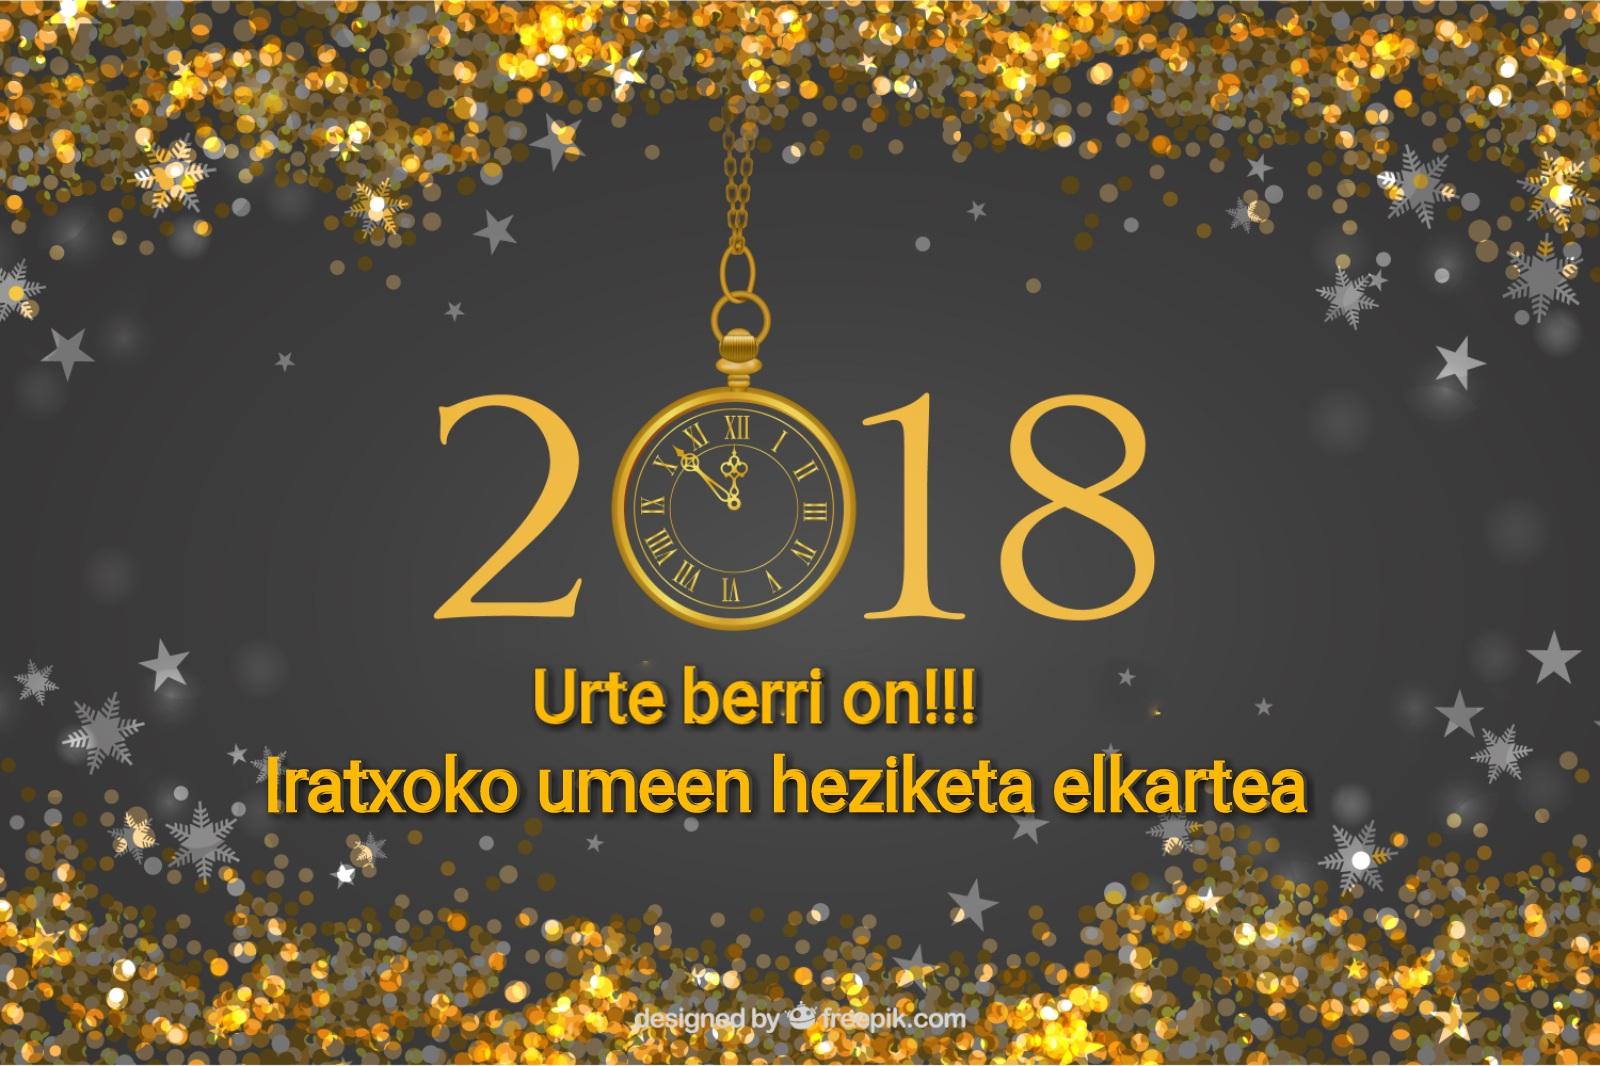 Feliz Ano Nuevo